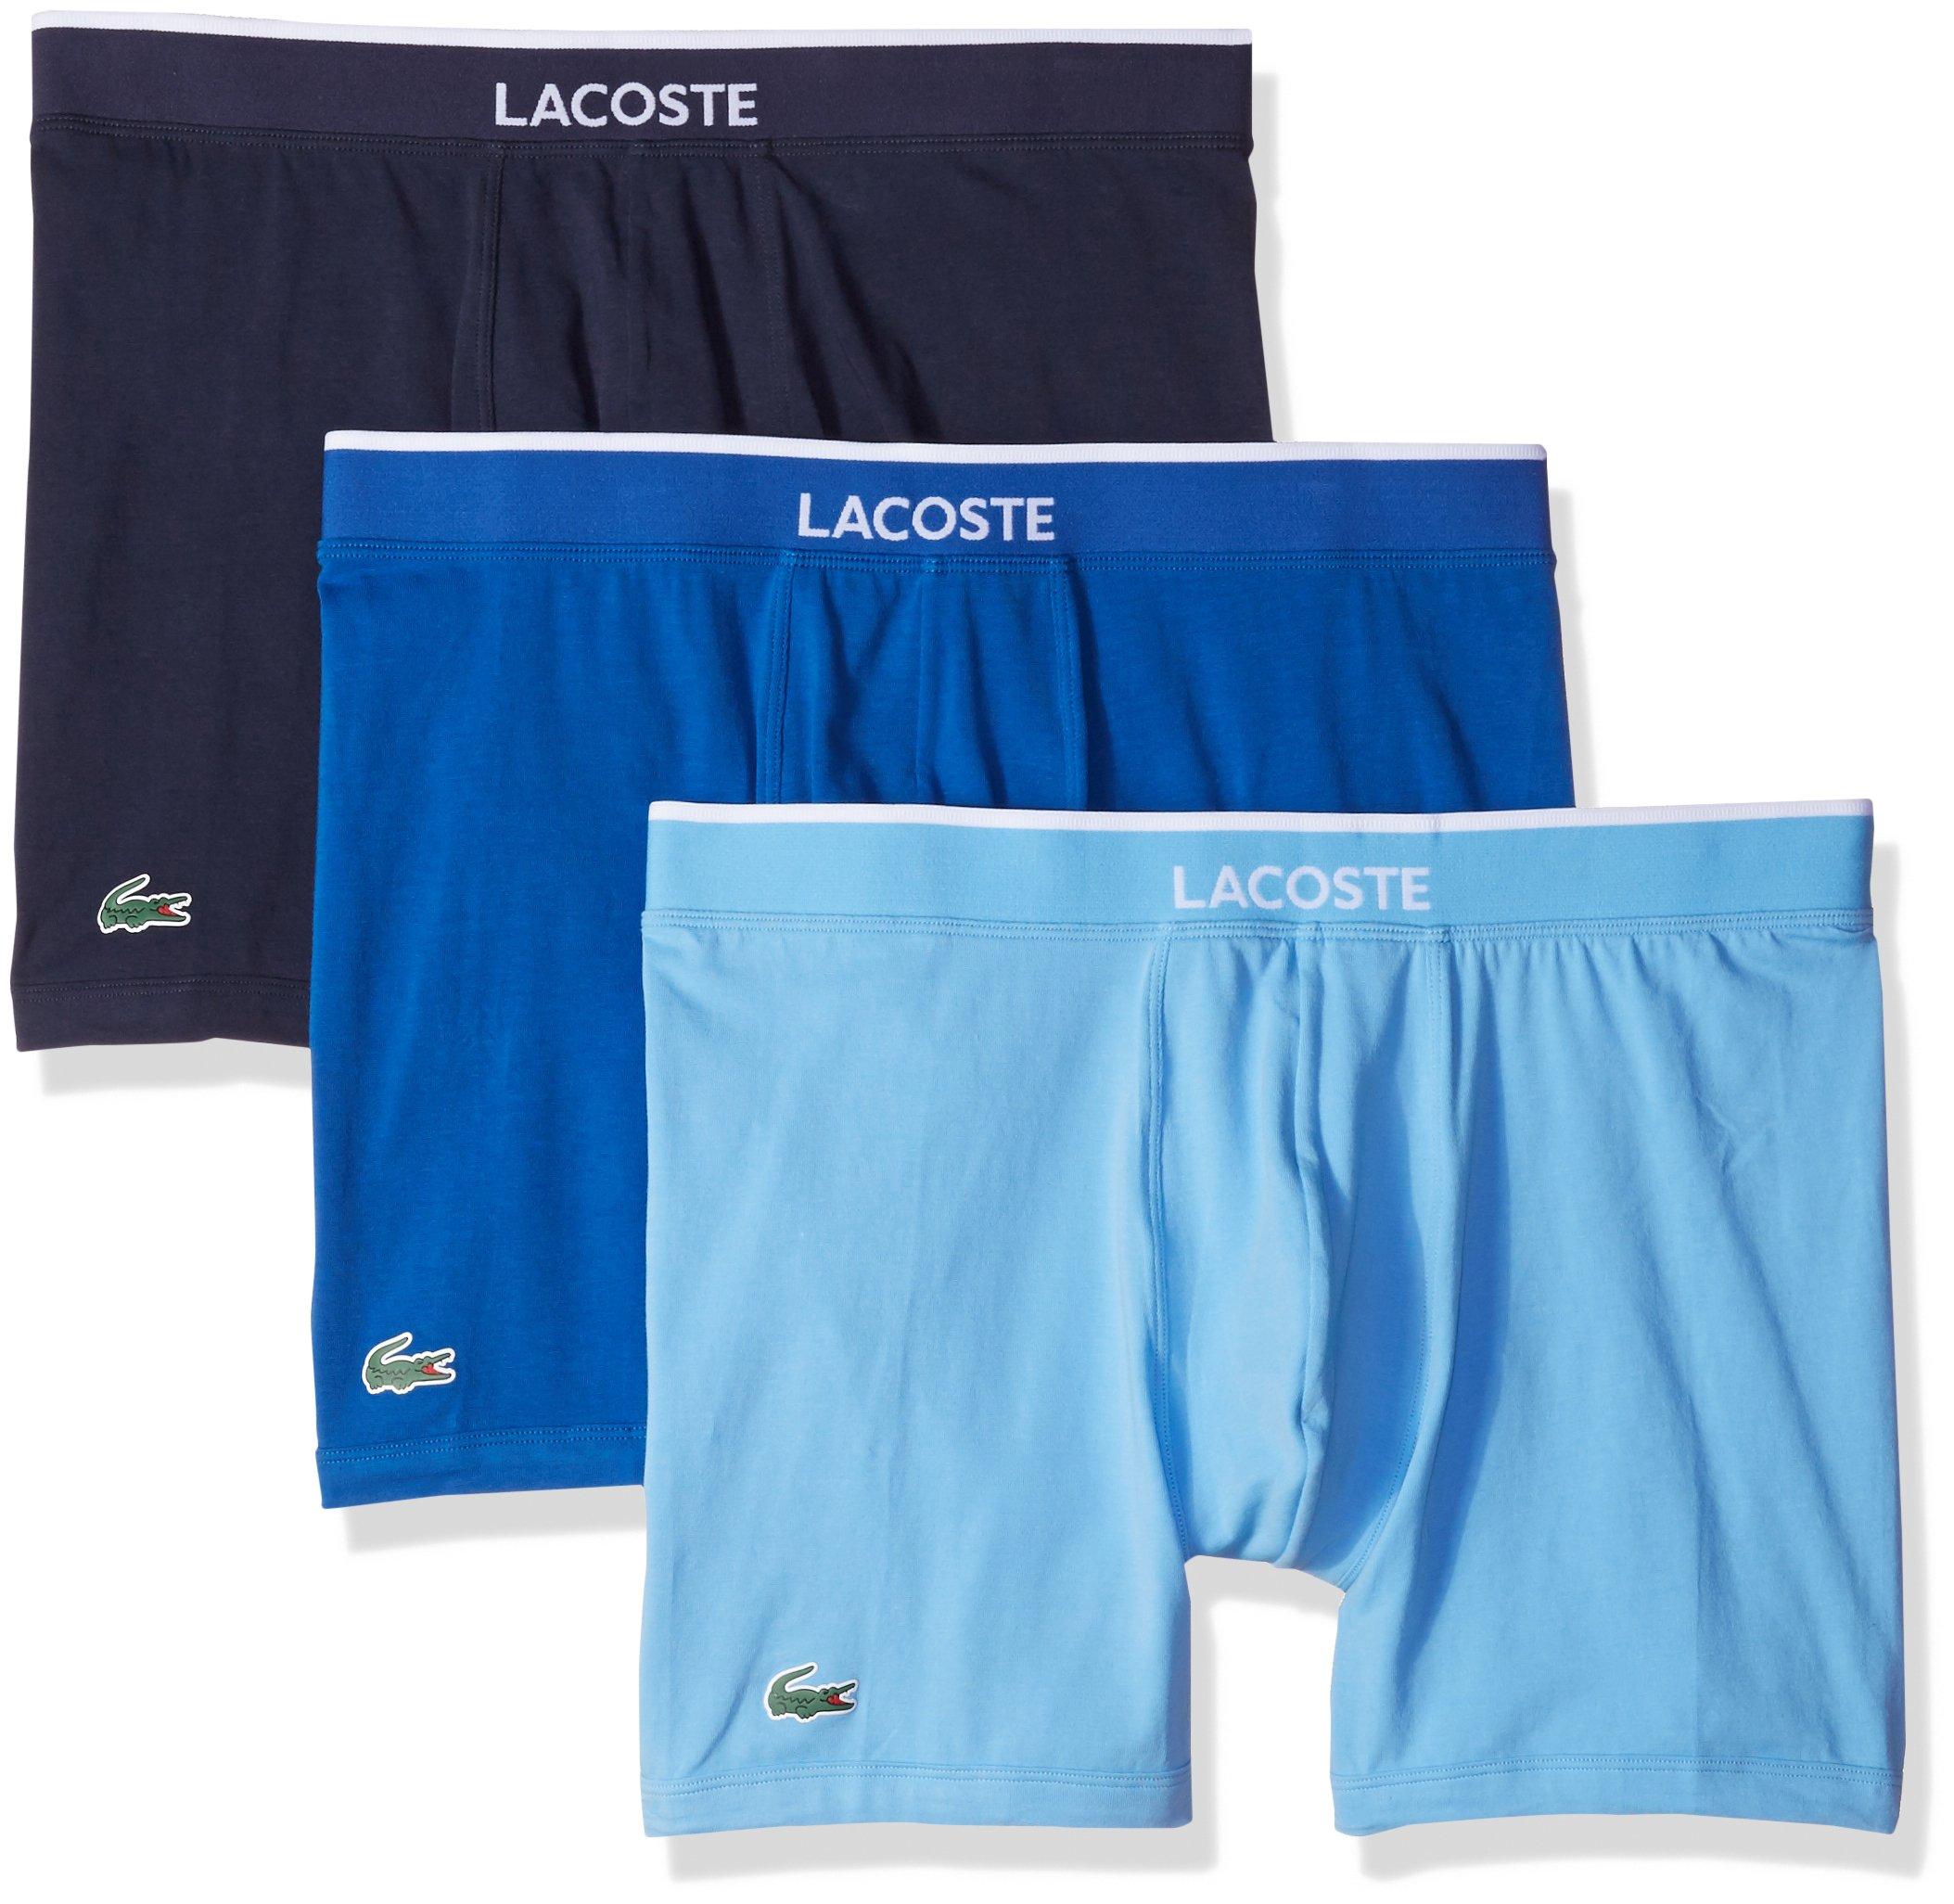 d65c6e28b6aa Galleon - Lacoste Men's 3 Pack Cotton Stretch Boxer Brief, Light Blue/Navy,  Medium